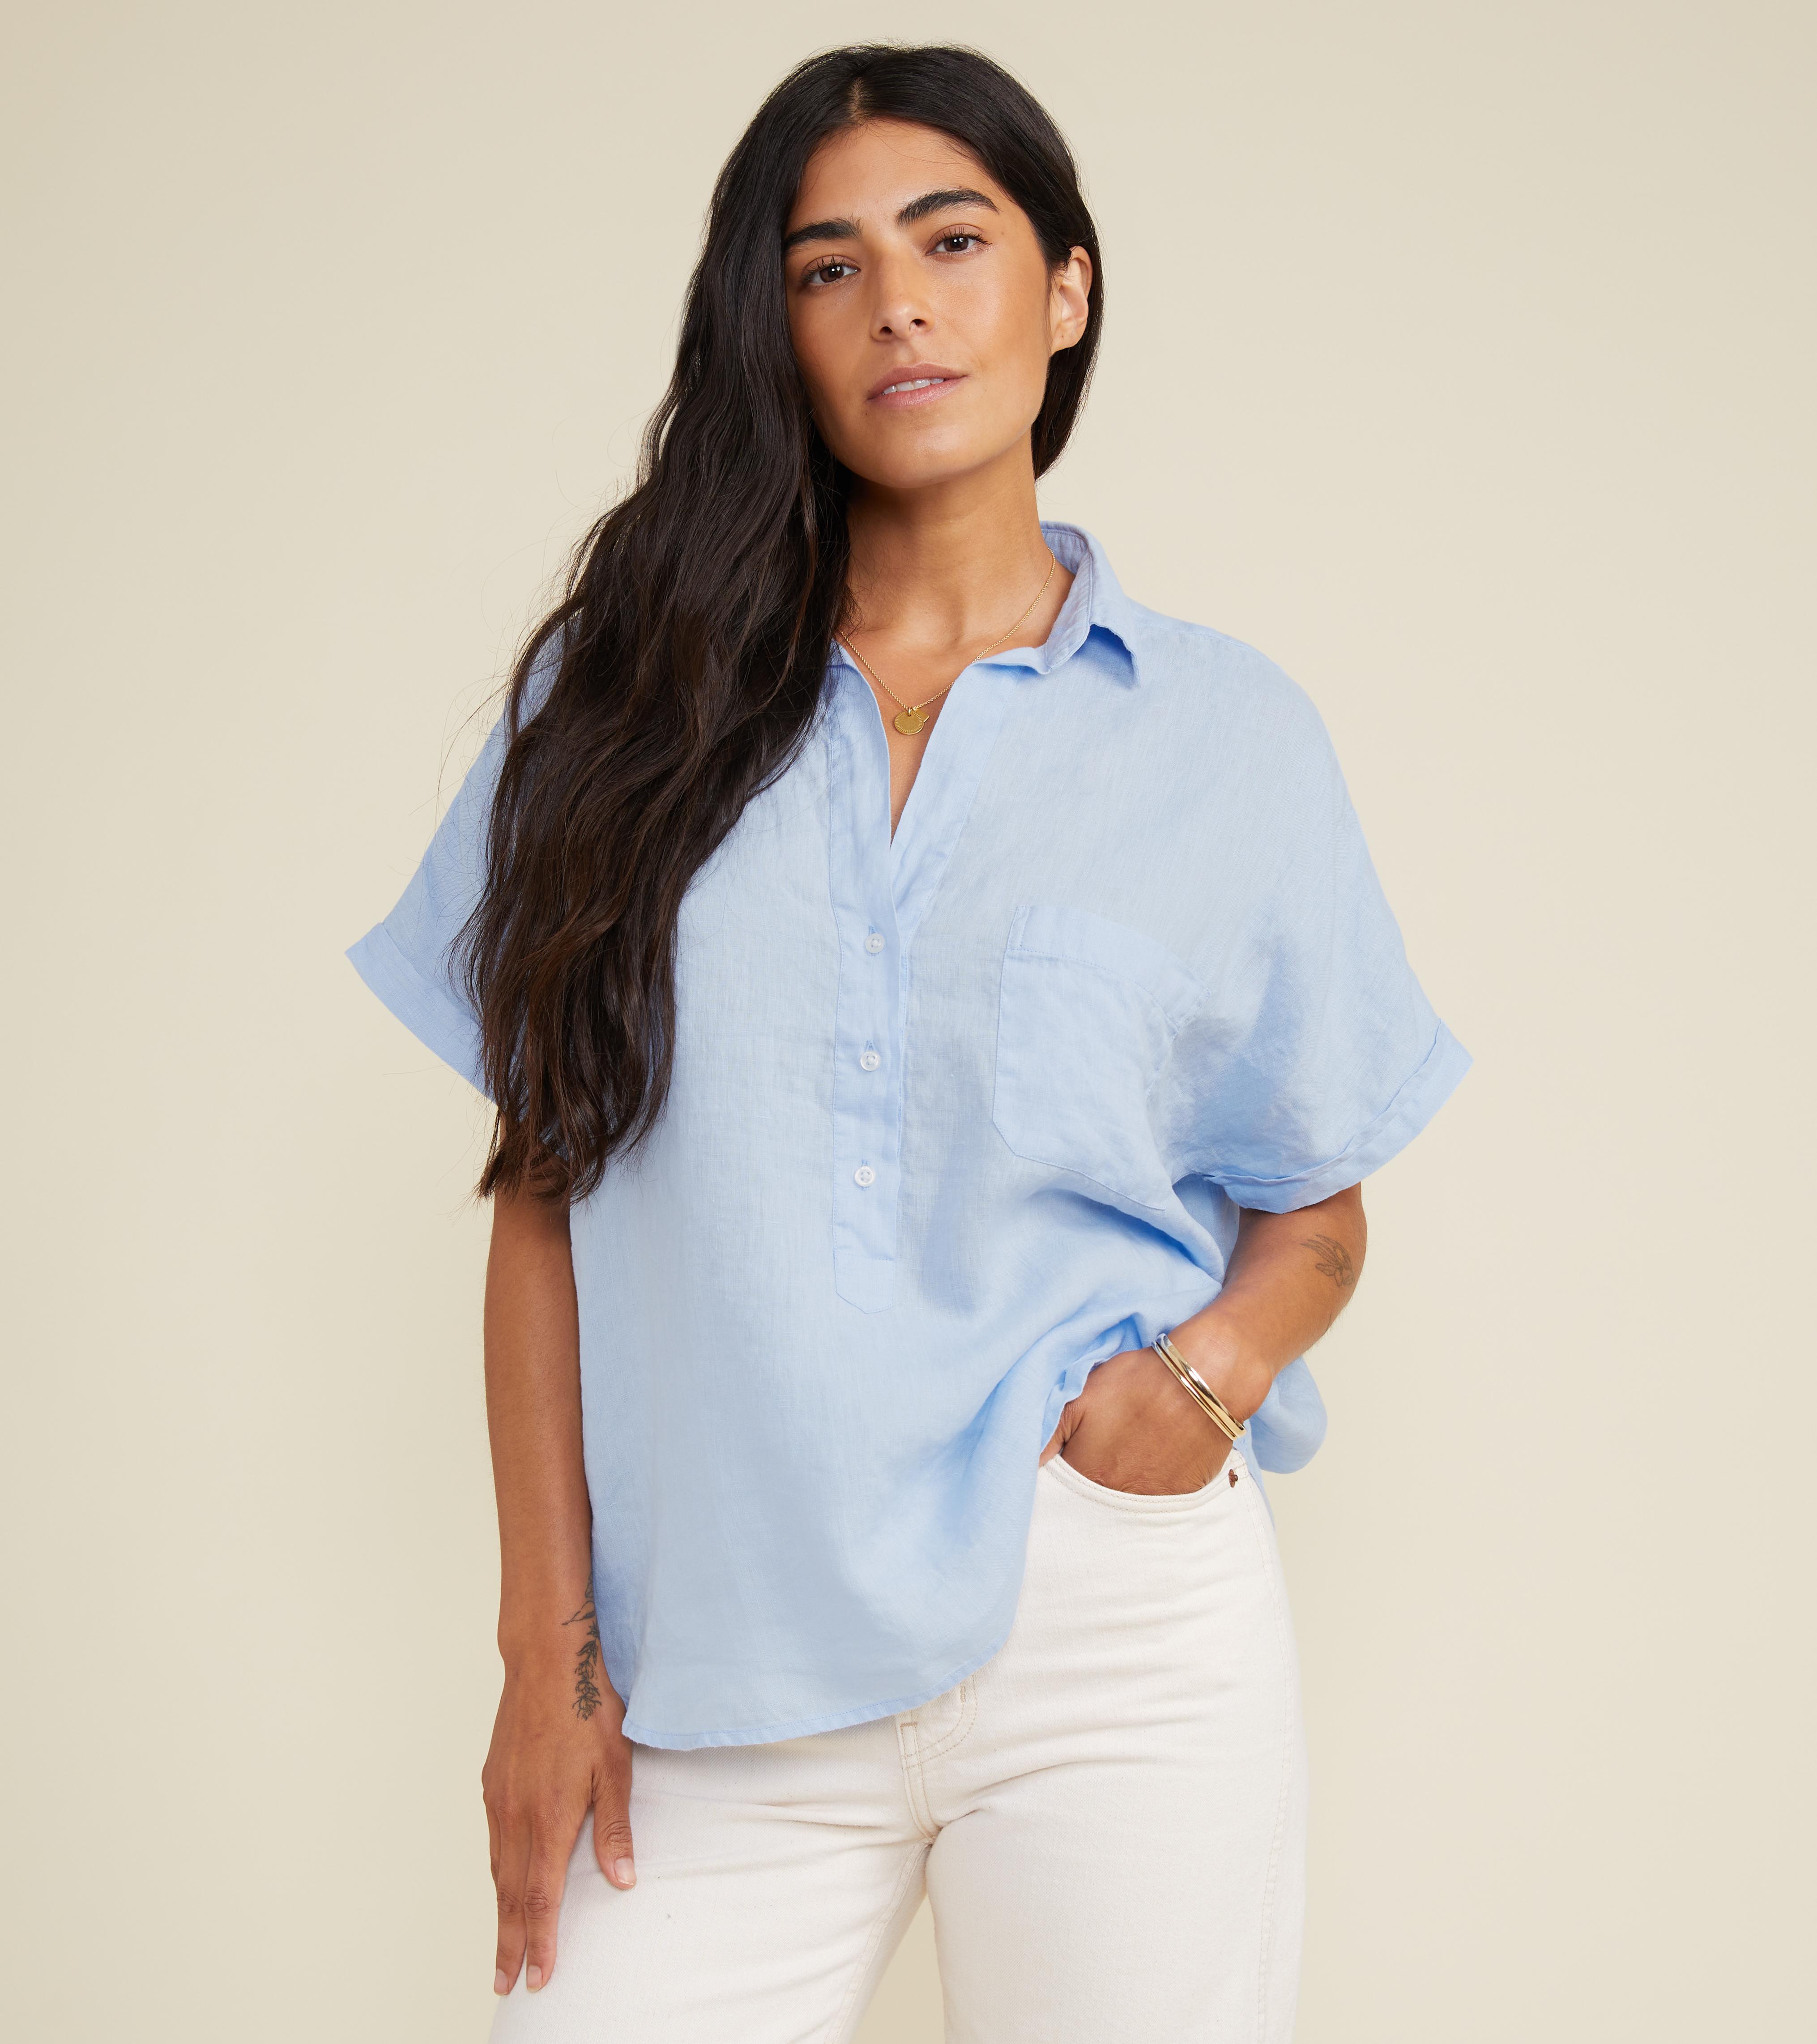 Image of The Artist Short Sleeve Shirt Cloud, Tumbled Linen Final Sale